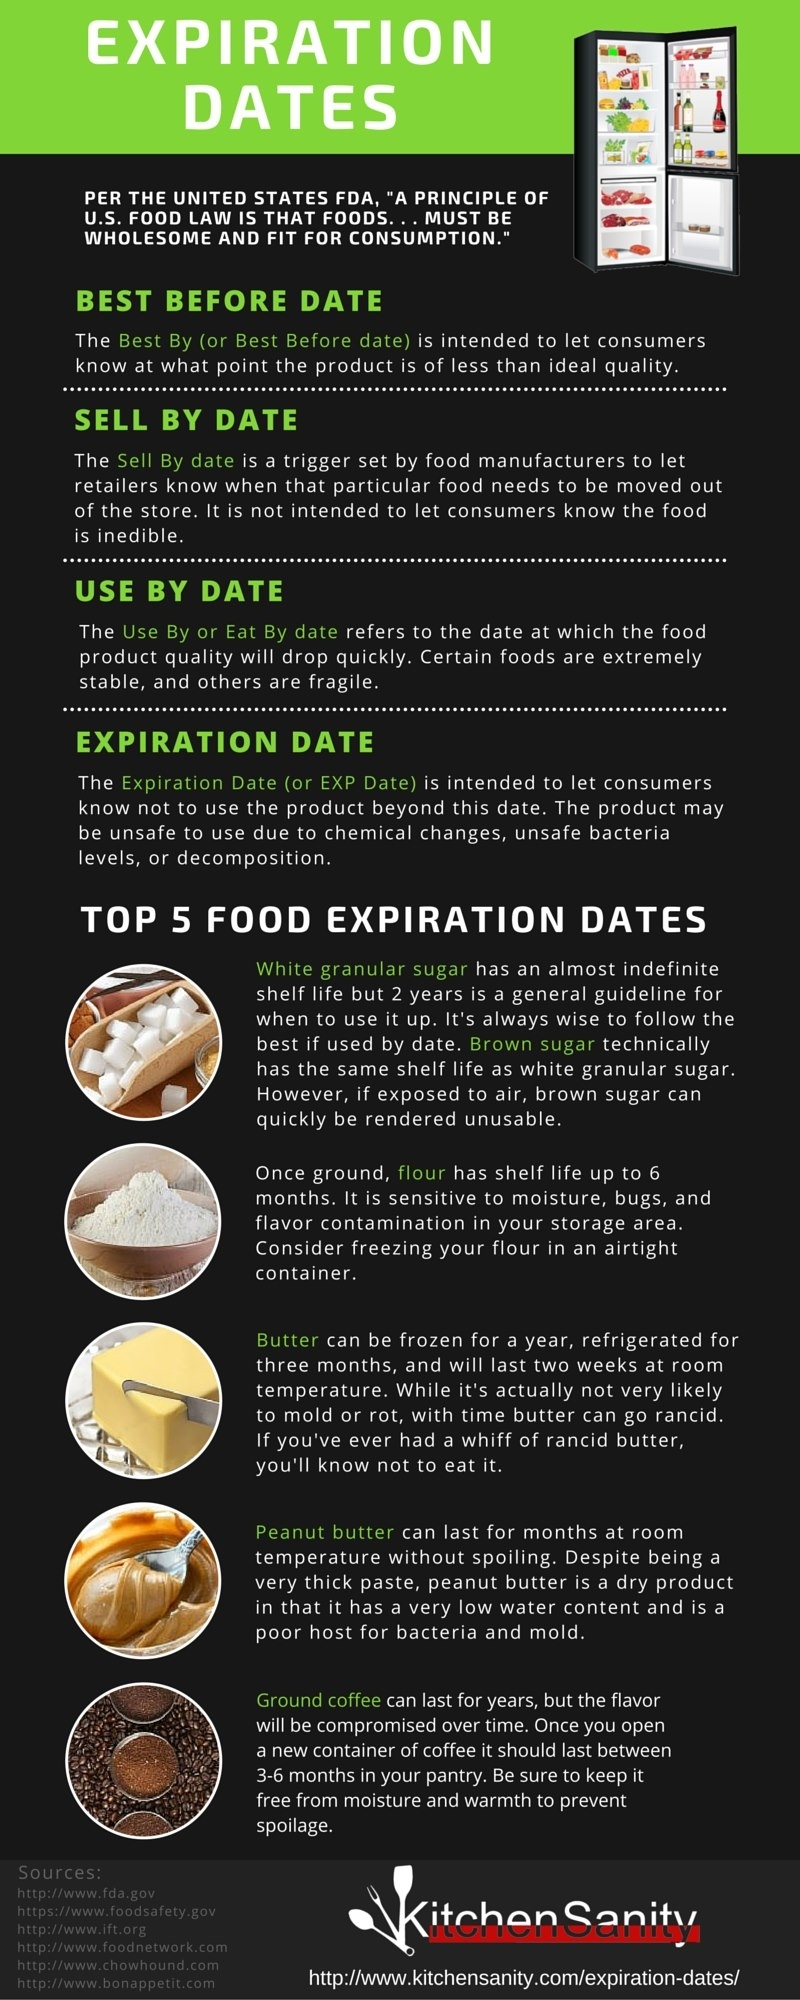 Food Expiration Dates & Safety | Kitchensanity